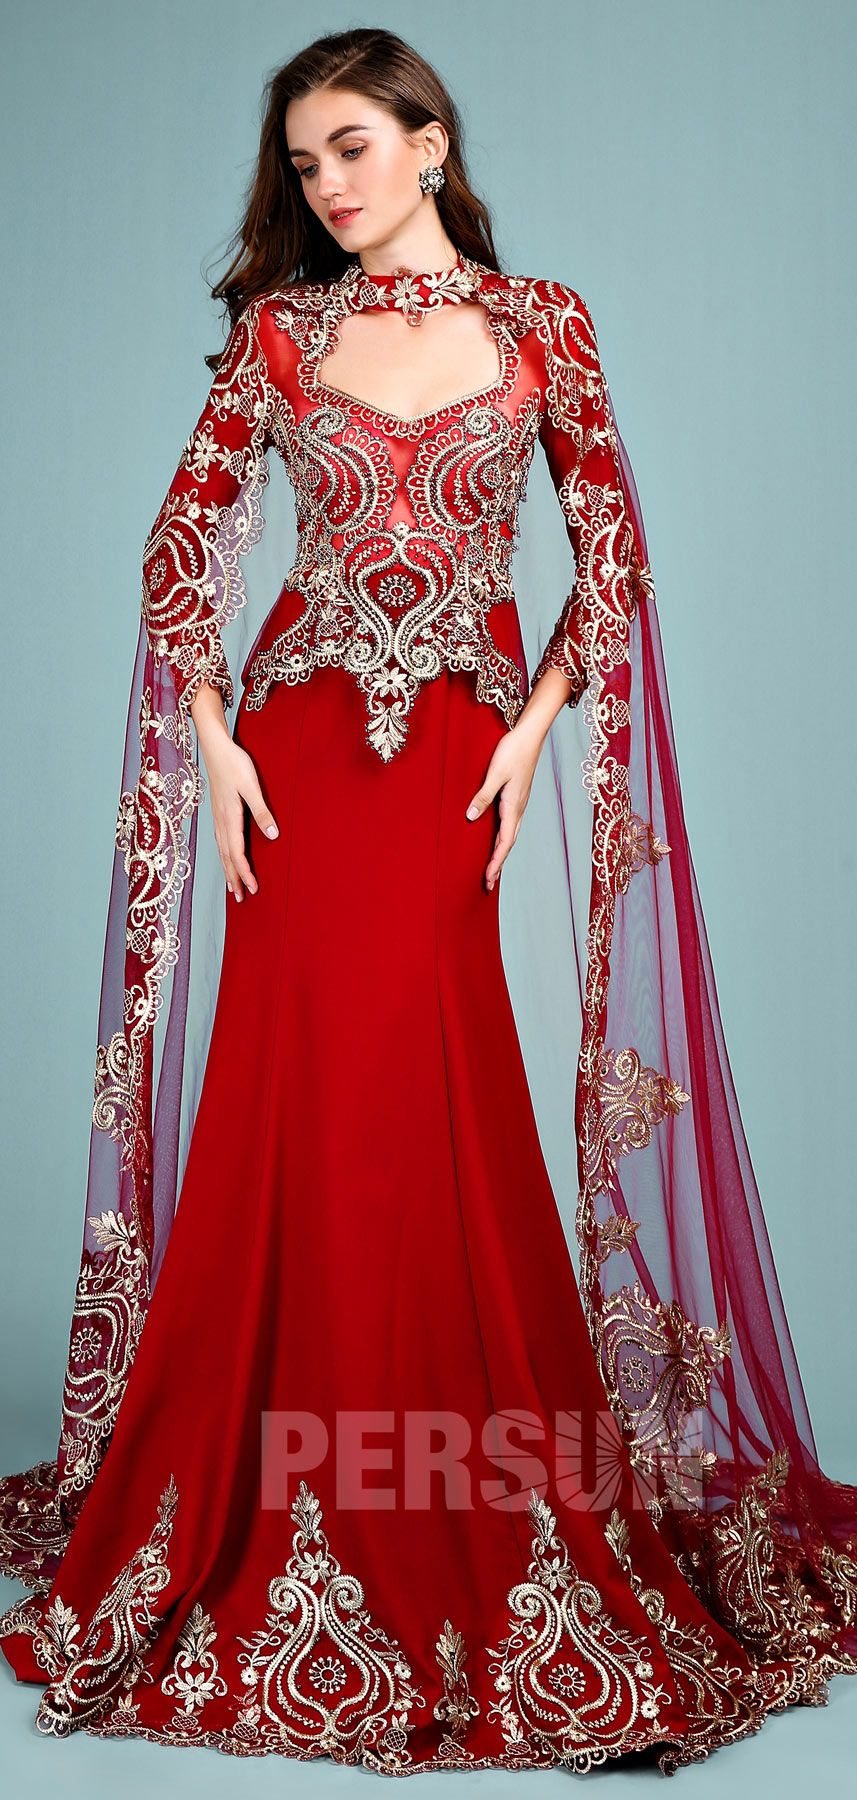 Anju : Robe de mariée rouge style indien